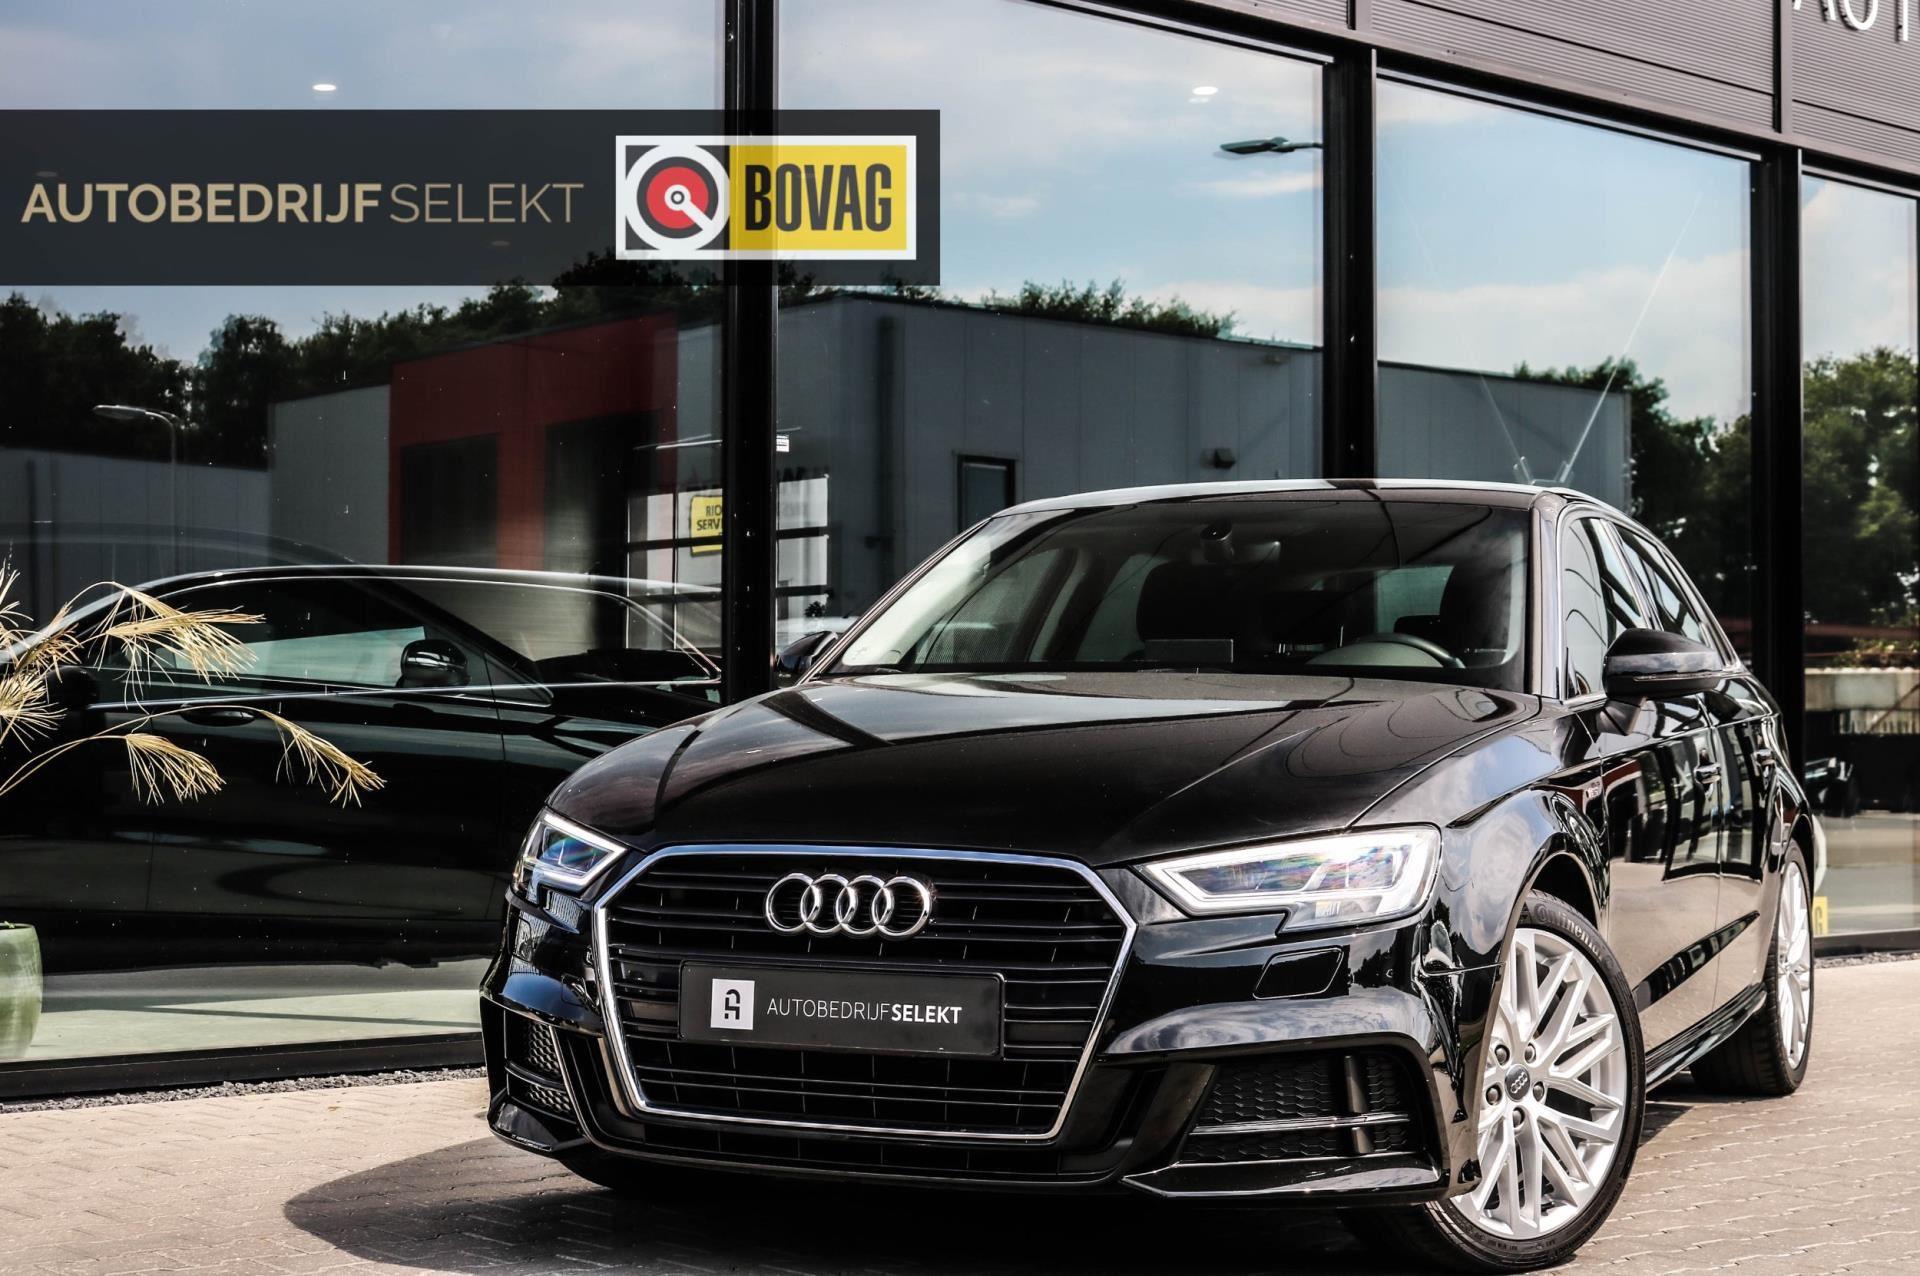 Audi A3 Sportback occasion - Autobedrijf Selekt B.V.